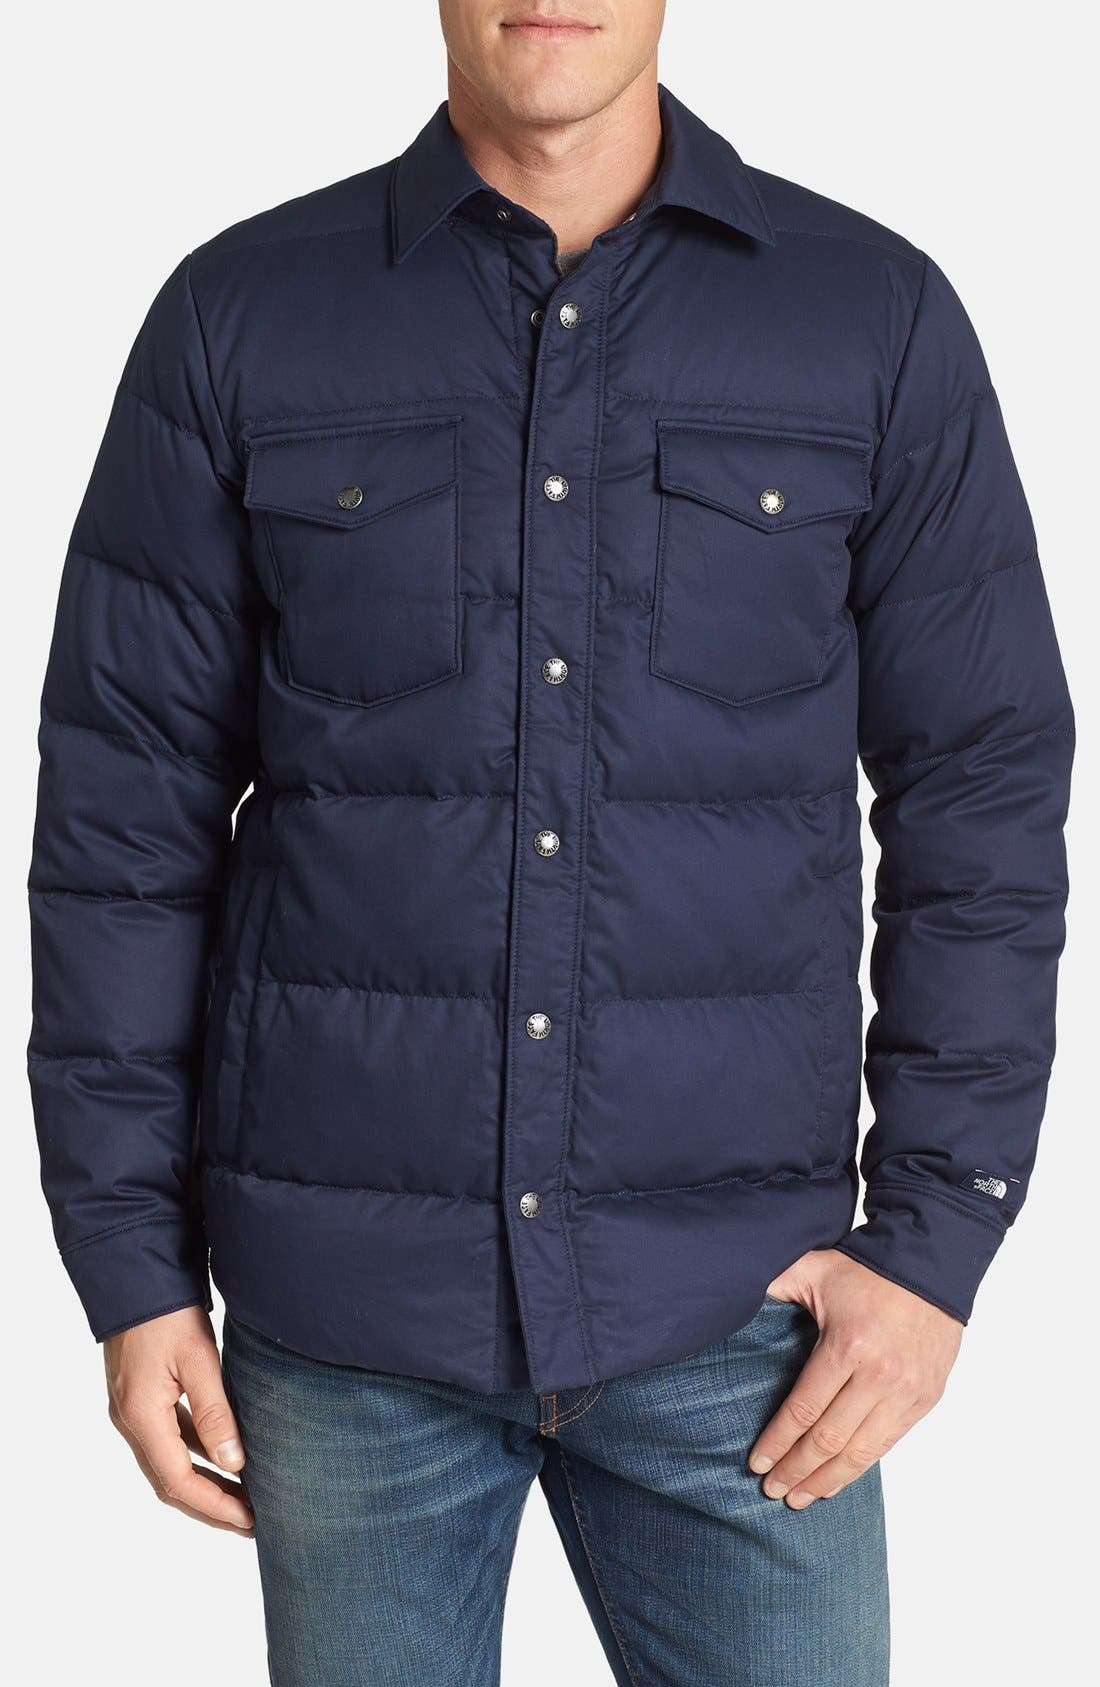 Main Image - The North Face 'Cook' Down Shirt Jacket